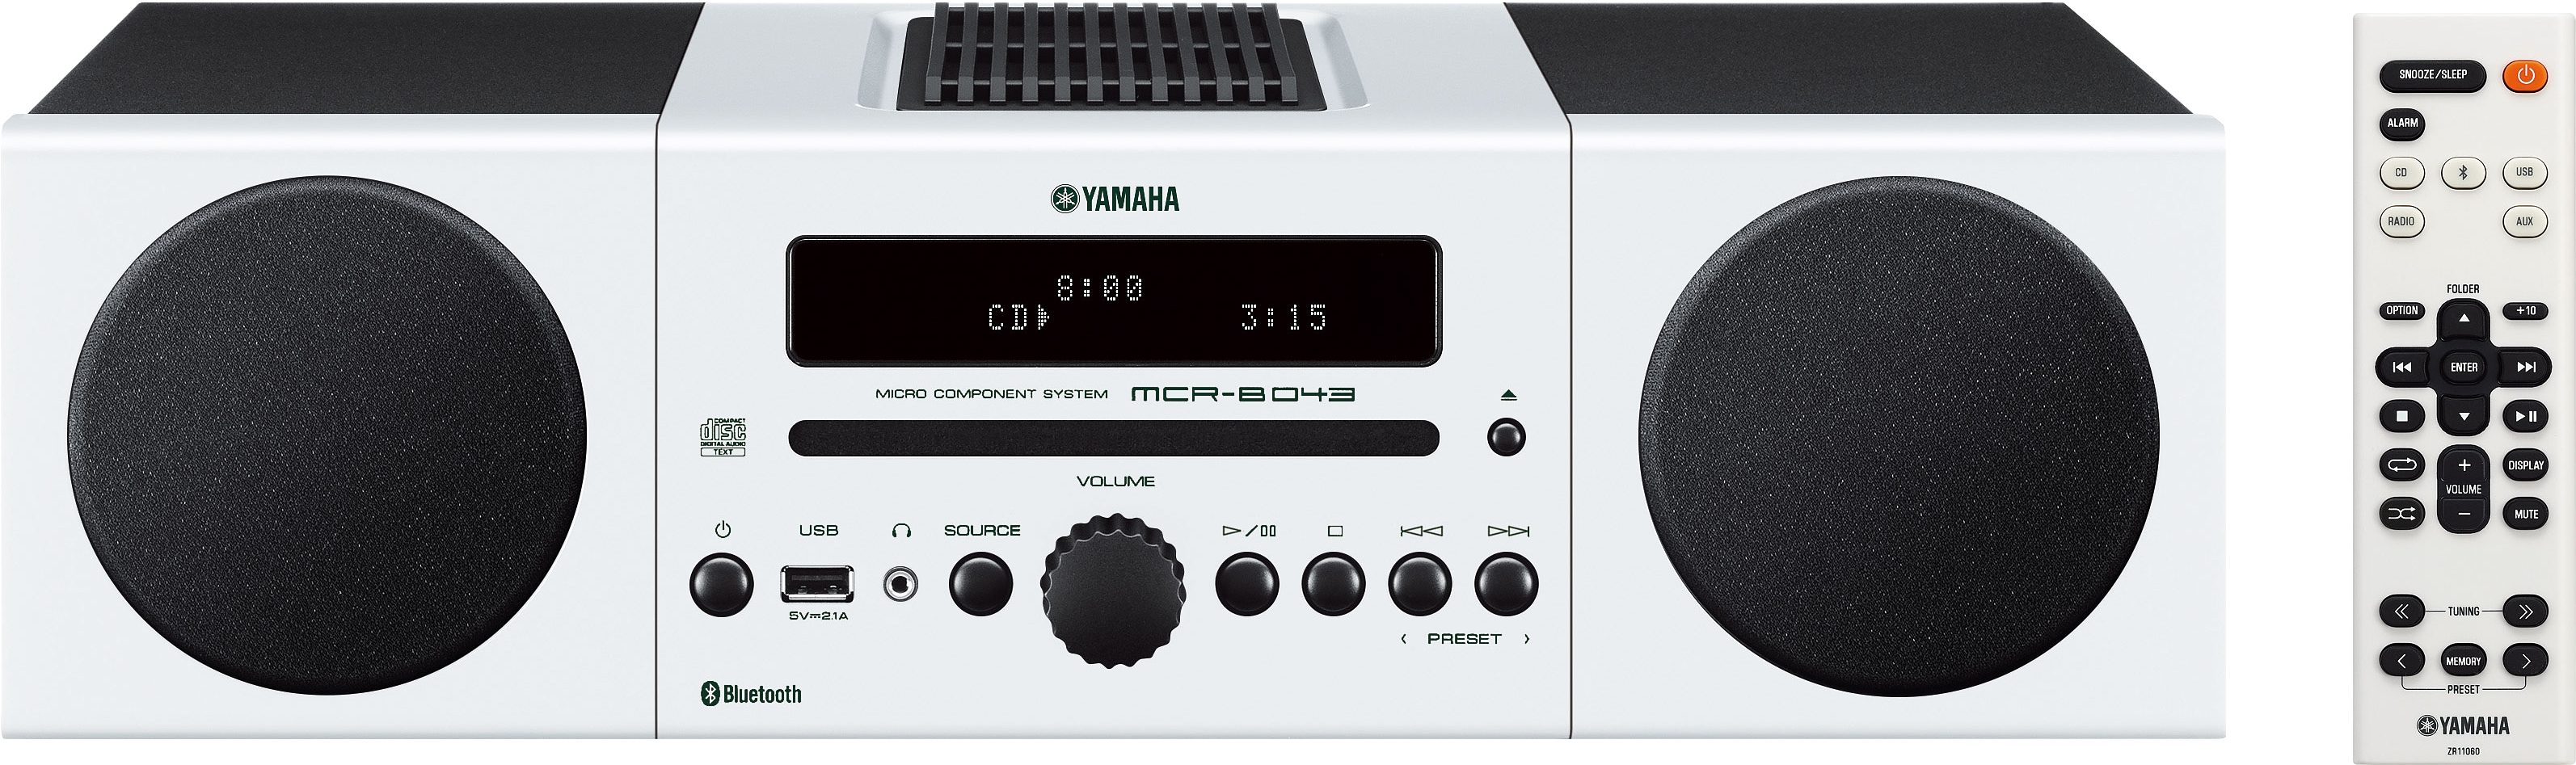 Yamaha MCR-B043 Kompaktanlage, Bluetooth, 1x USB